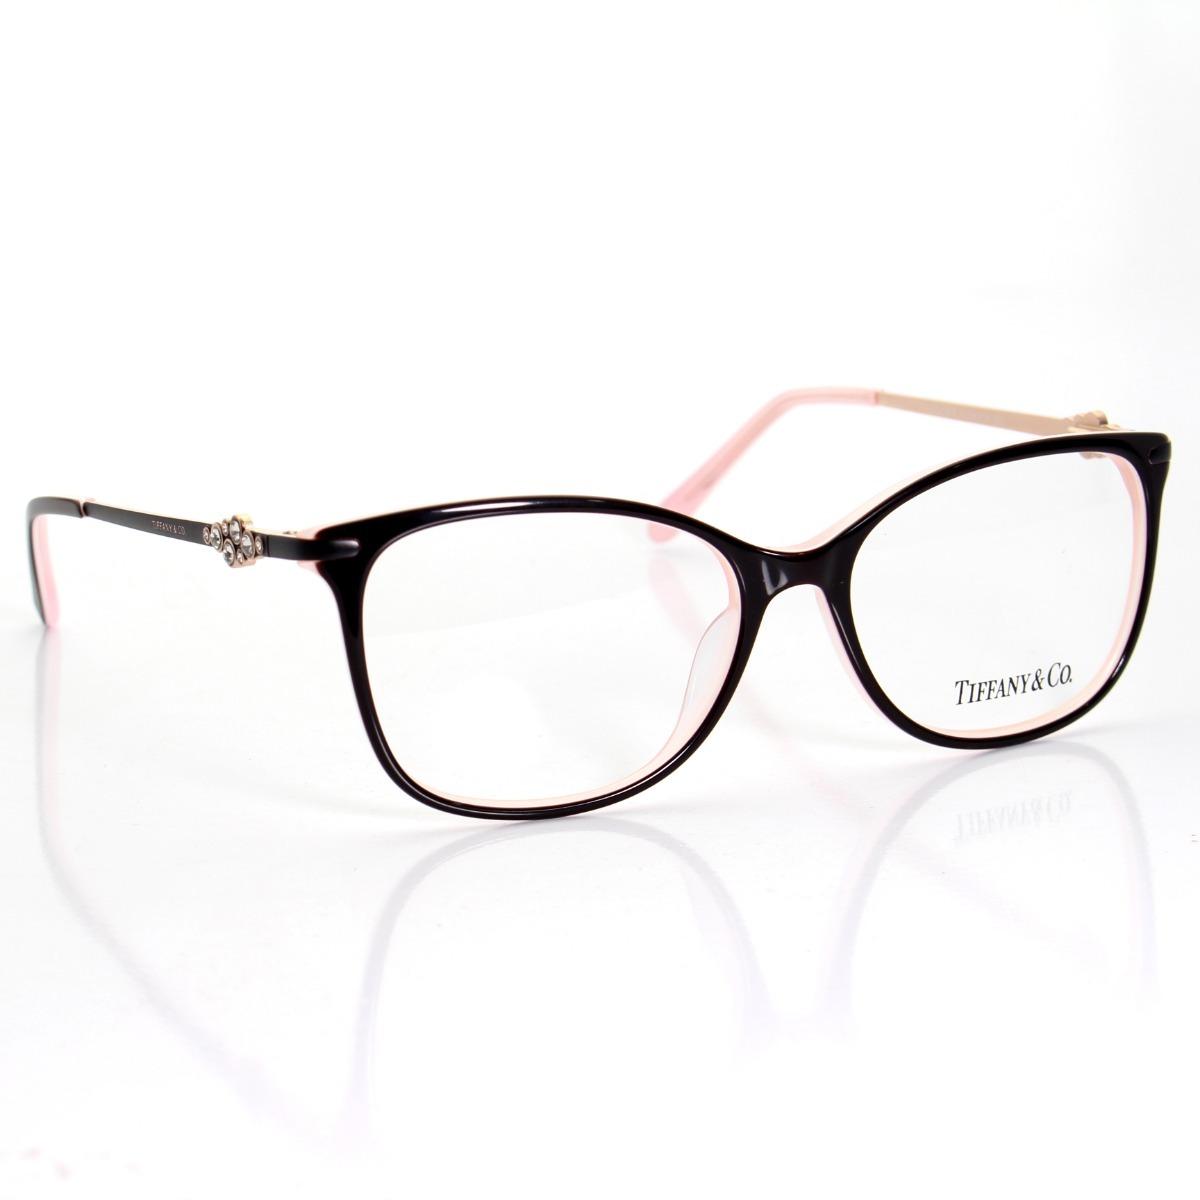 Armação De Grau - Tiffany   Co. Acetato - Tf2133 B Oculos - R  139 ... 8fc5ceaaa9